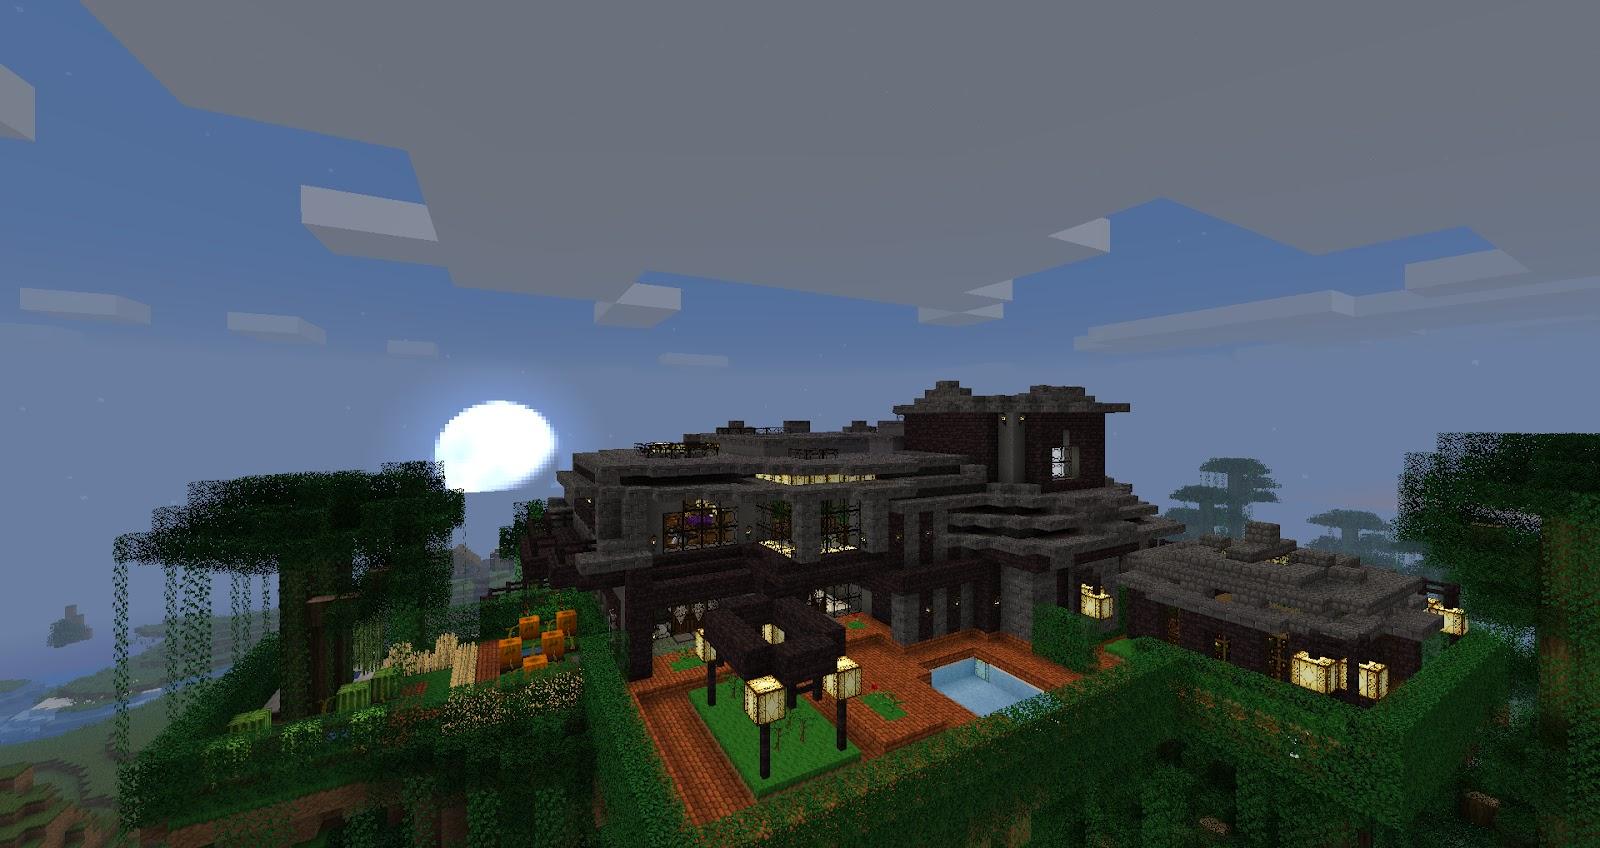 My Minecraft Constructions: Minecraft Luxury Mountain House